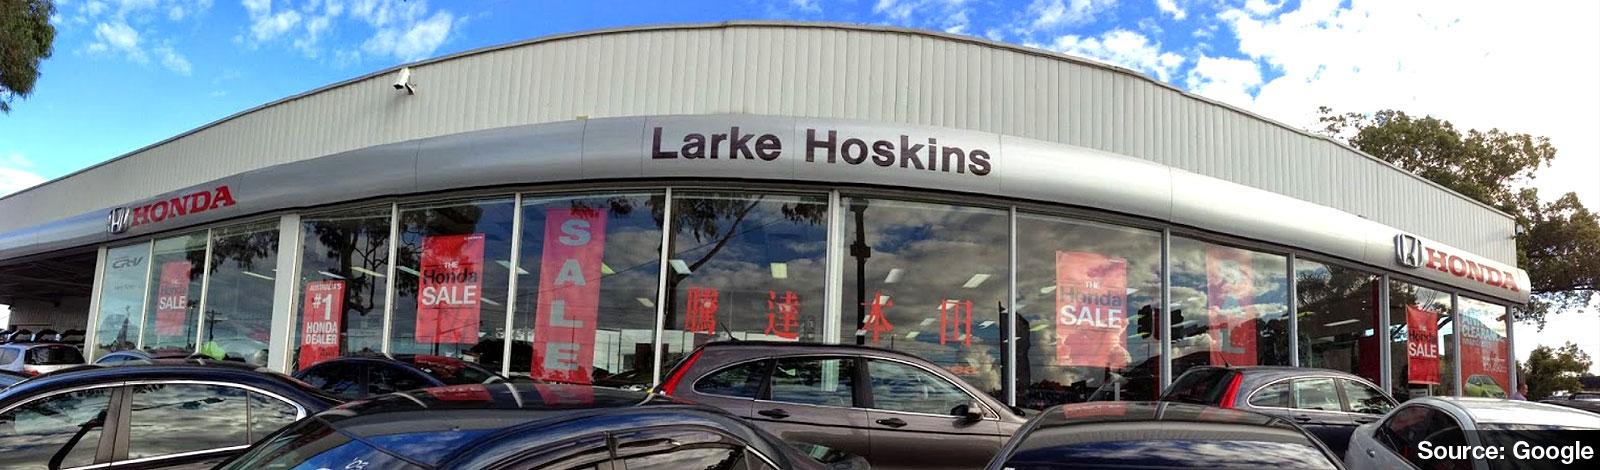 Larke hoskins honda service